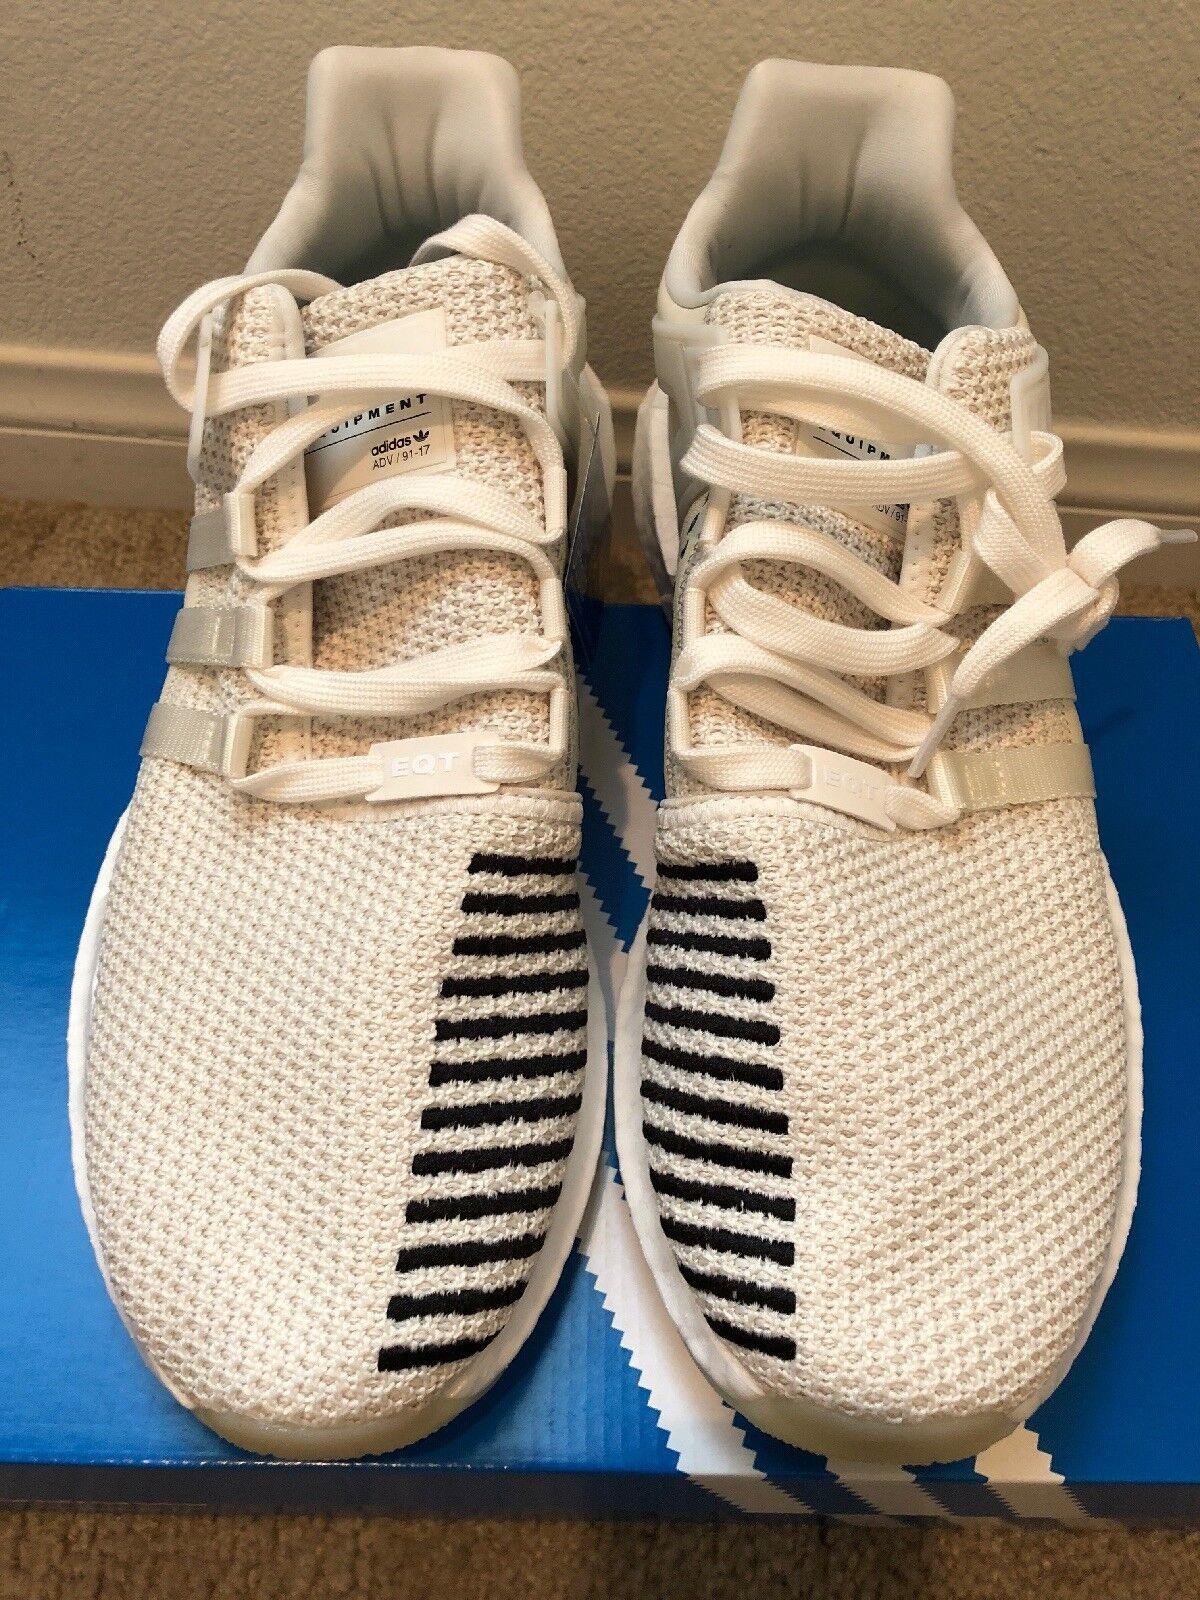 adidas eqt support 93/17 shoes men's 12.5